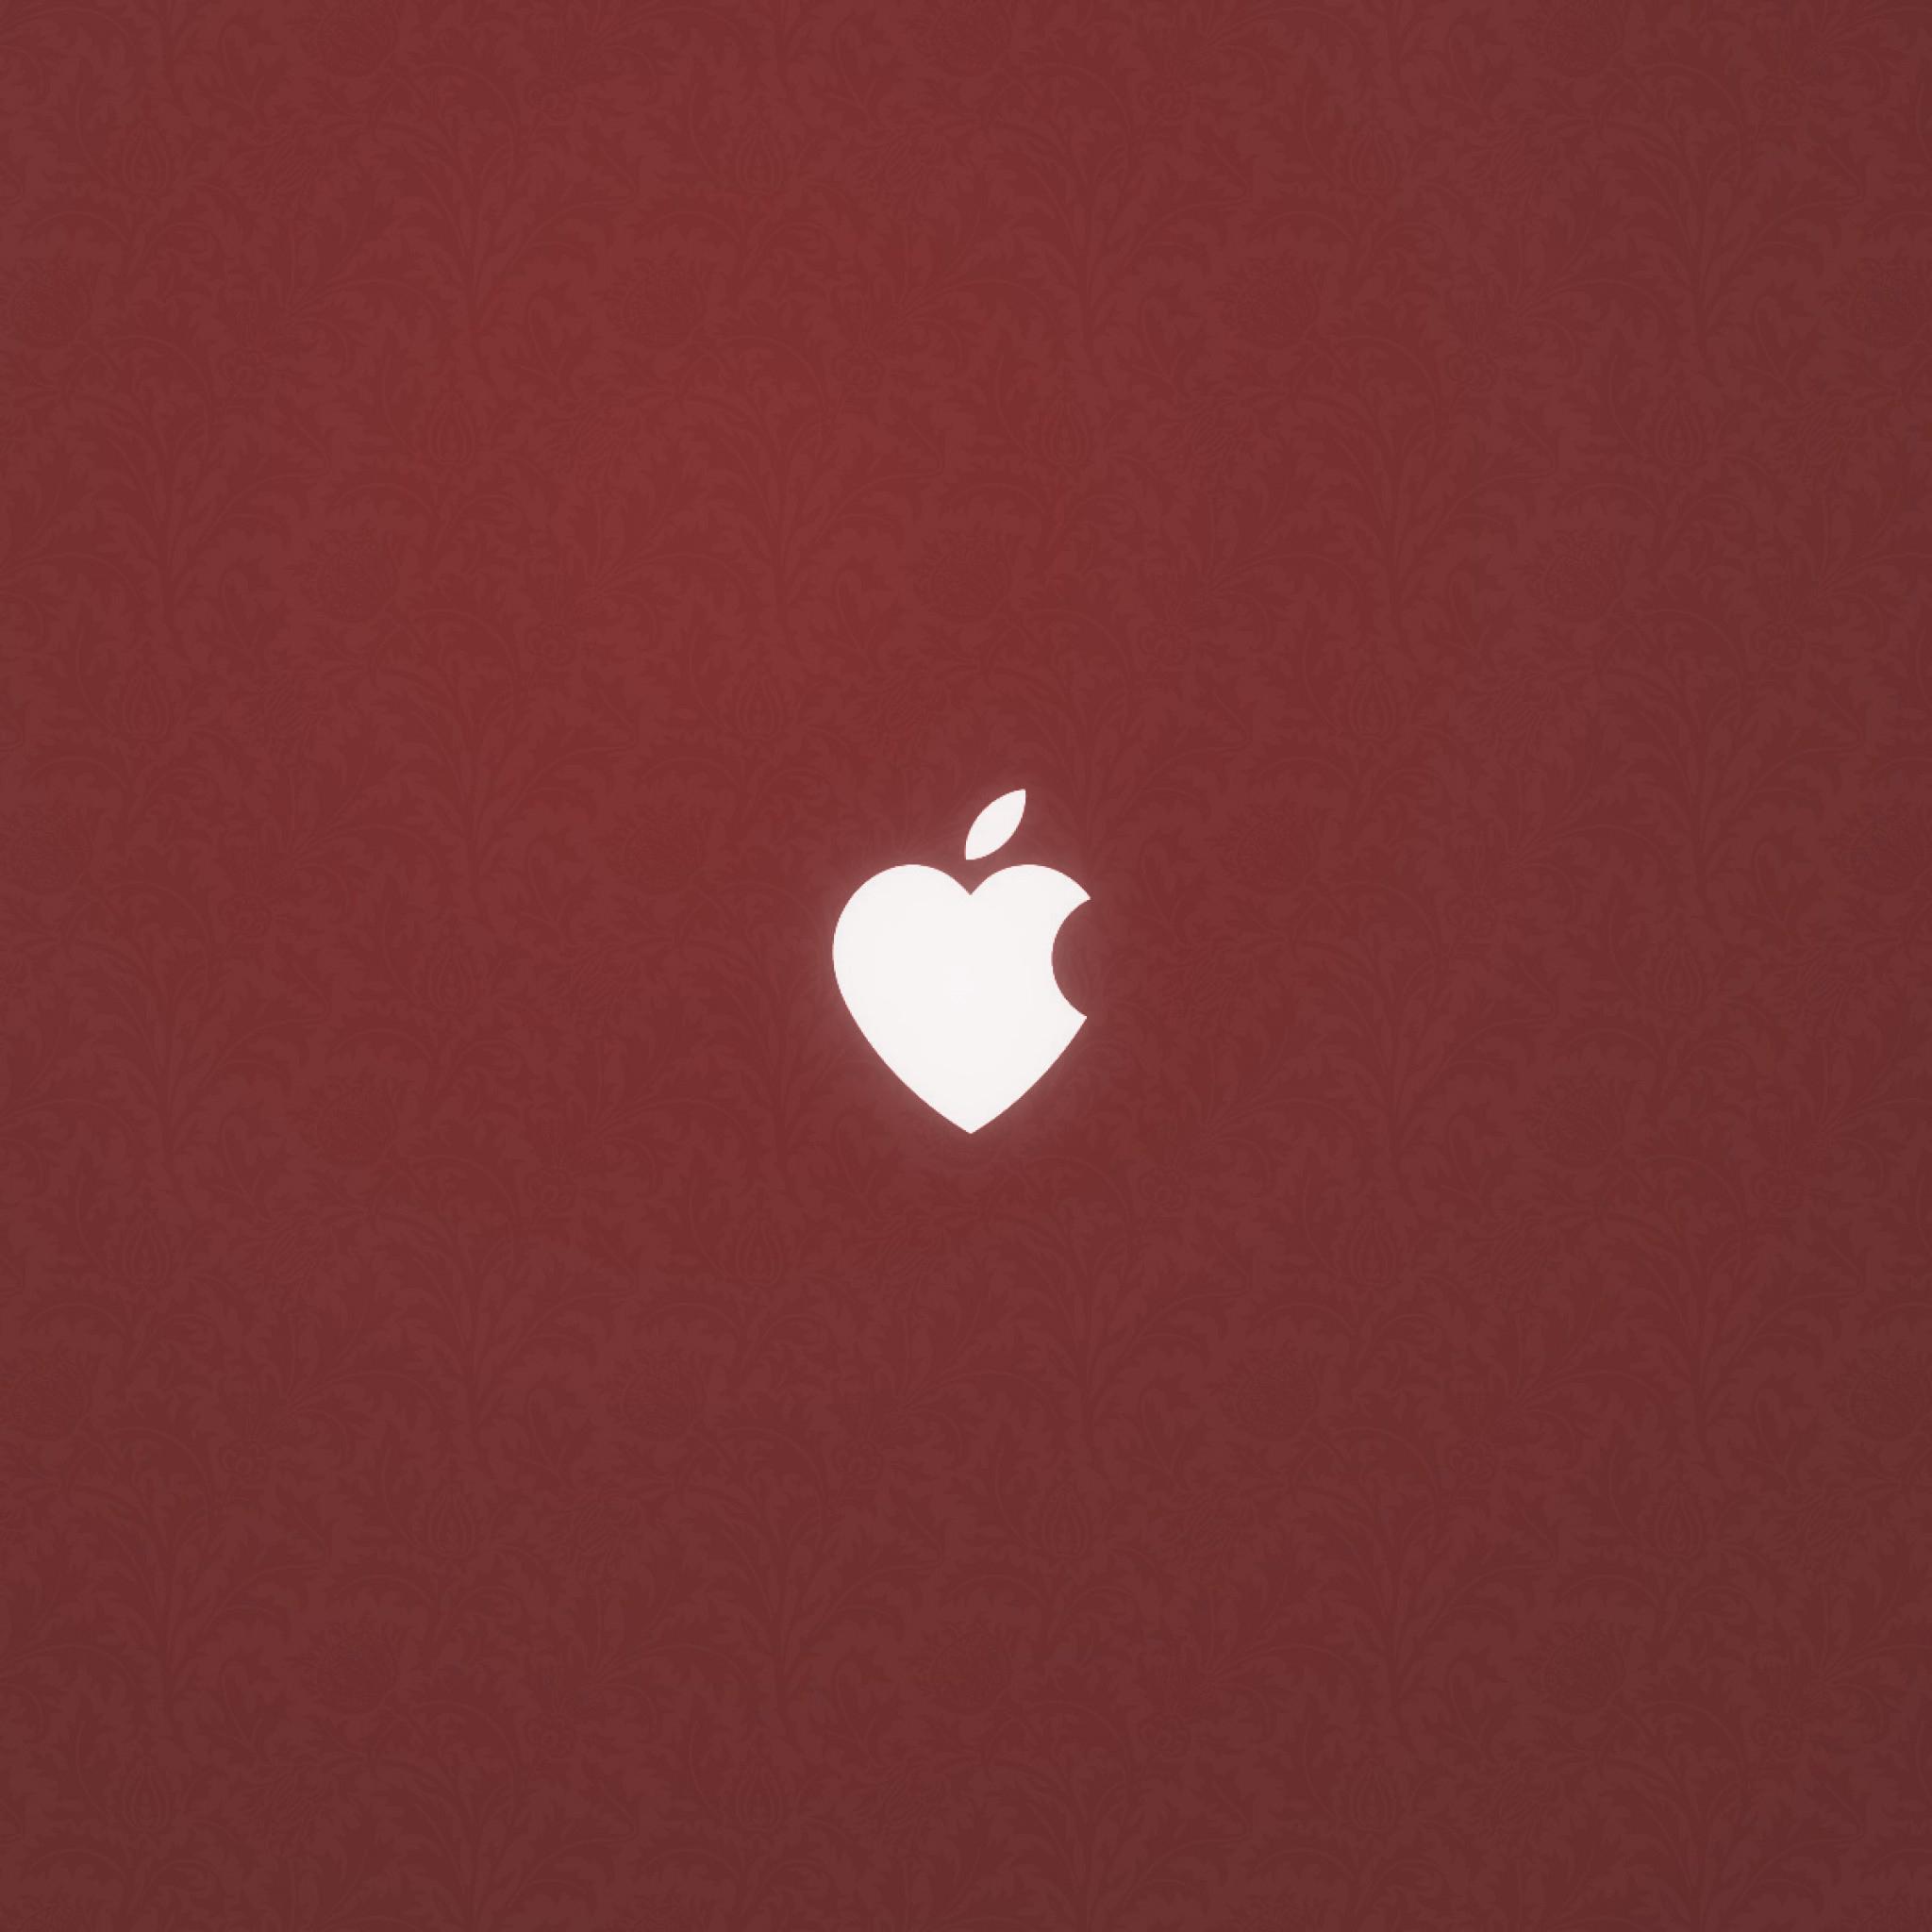 Apple-Heart-3Wallpapers-iPad-Retina